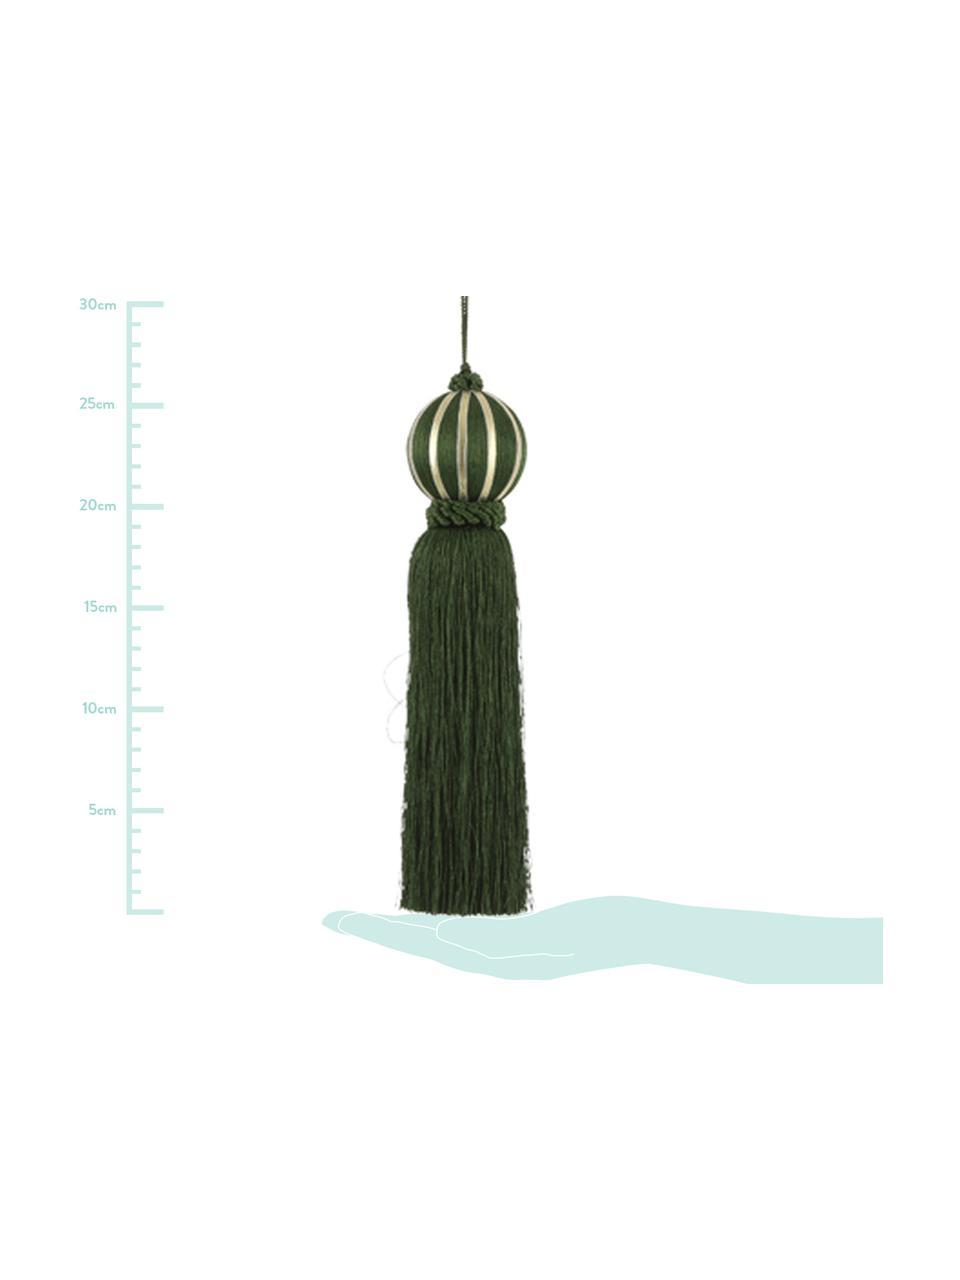 Nappa decorativa Asena 2 pz., Poliestere, Verde scuro, Ø 6 x Alt. 27 cm